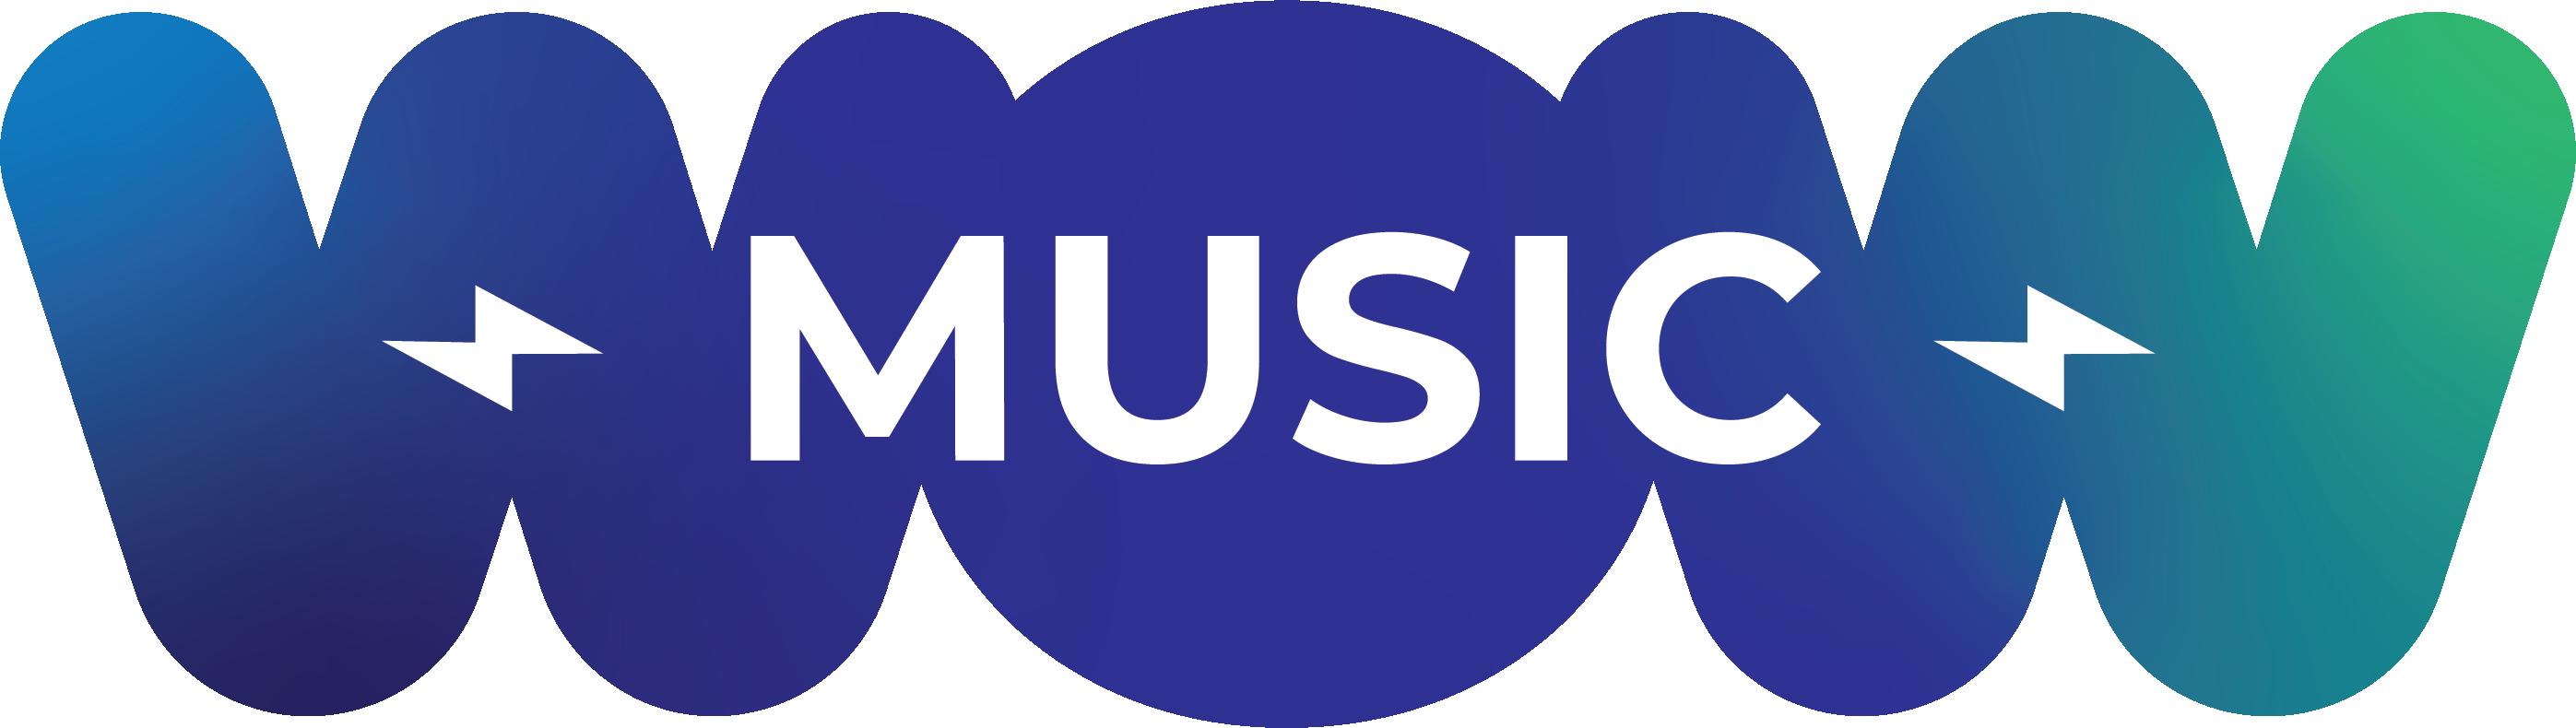 Wow-music